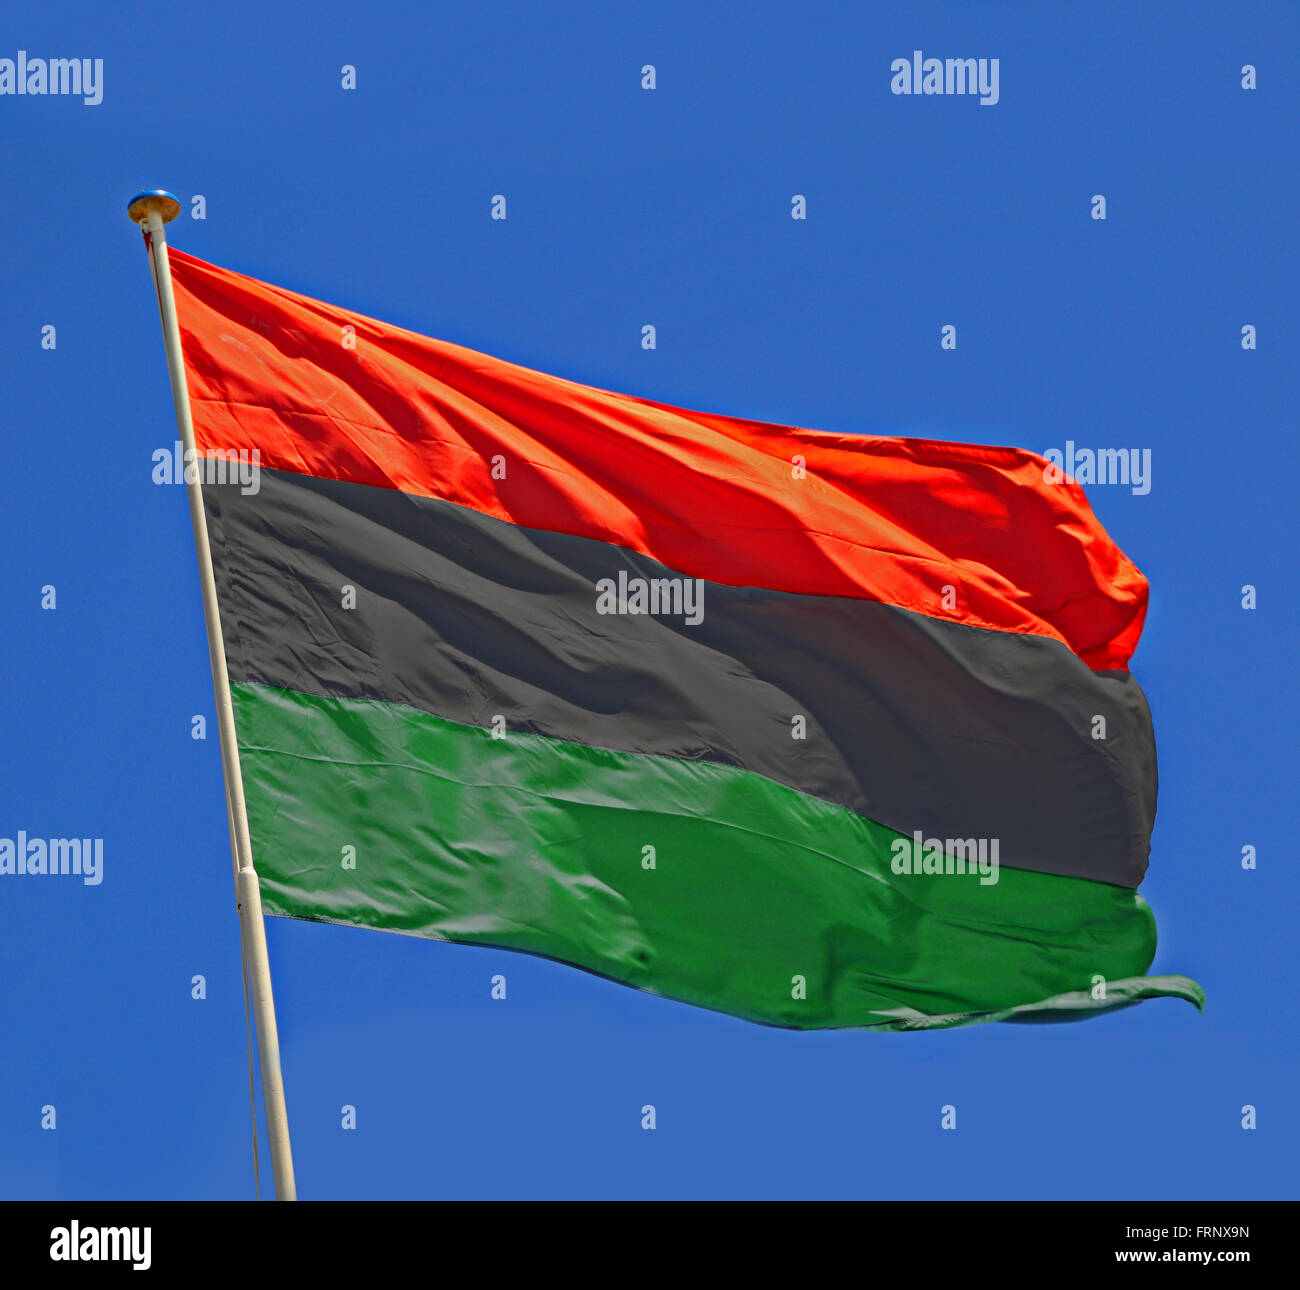 Libyan Flag fluttering in a brisk breeze. - Stock Image